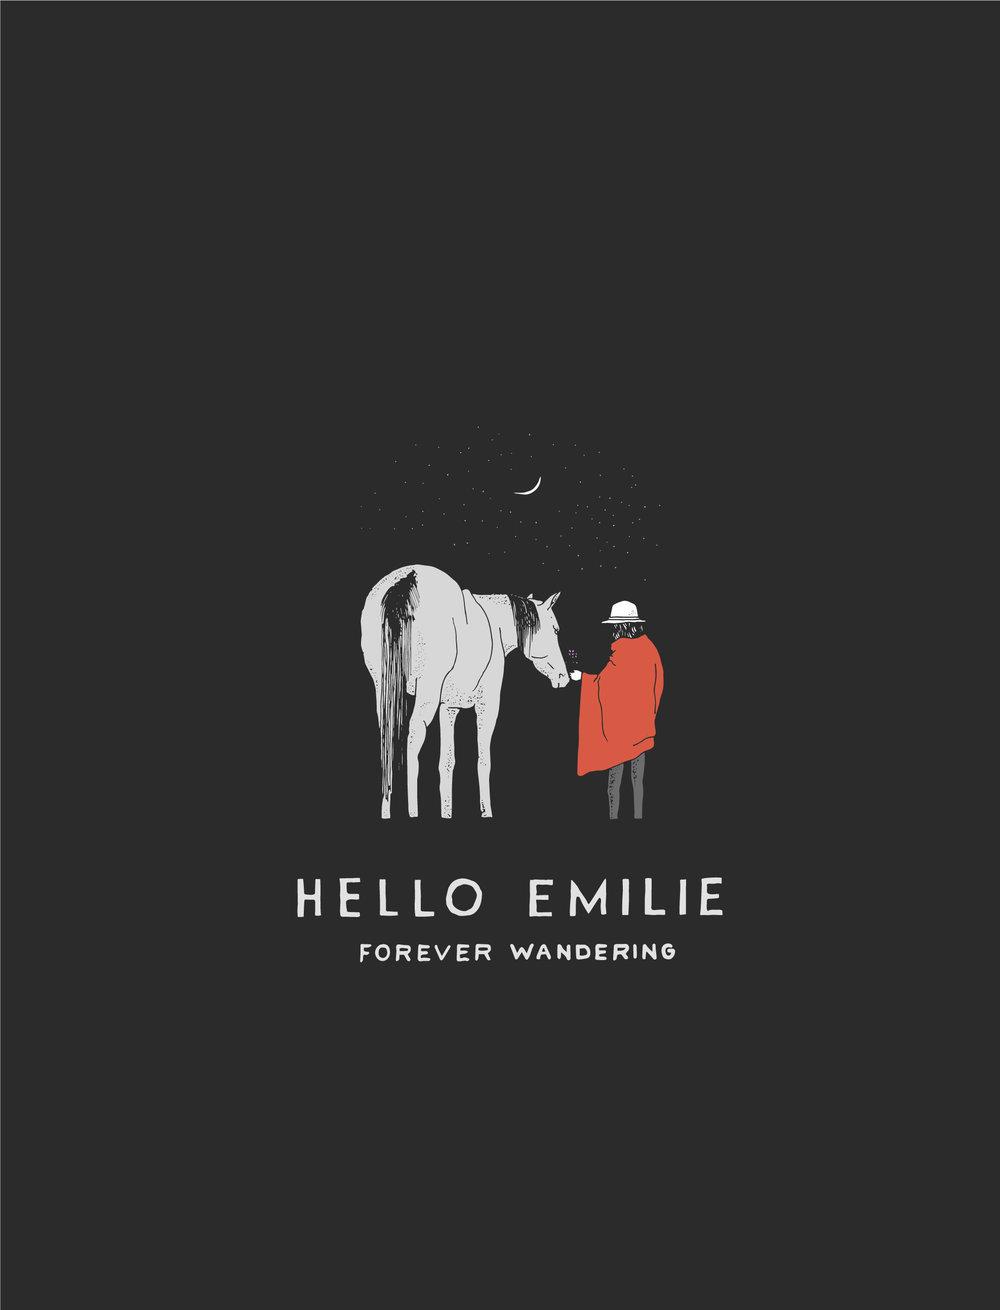 Hello_emilie_1.jpg